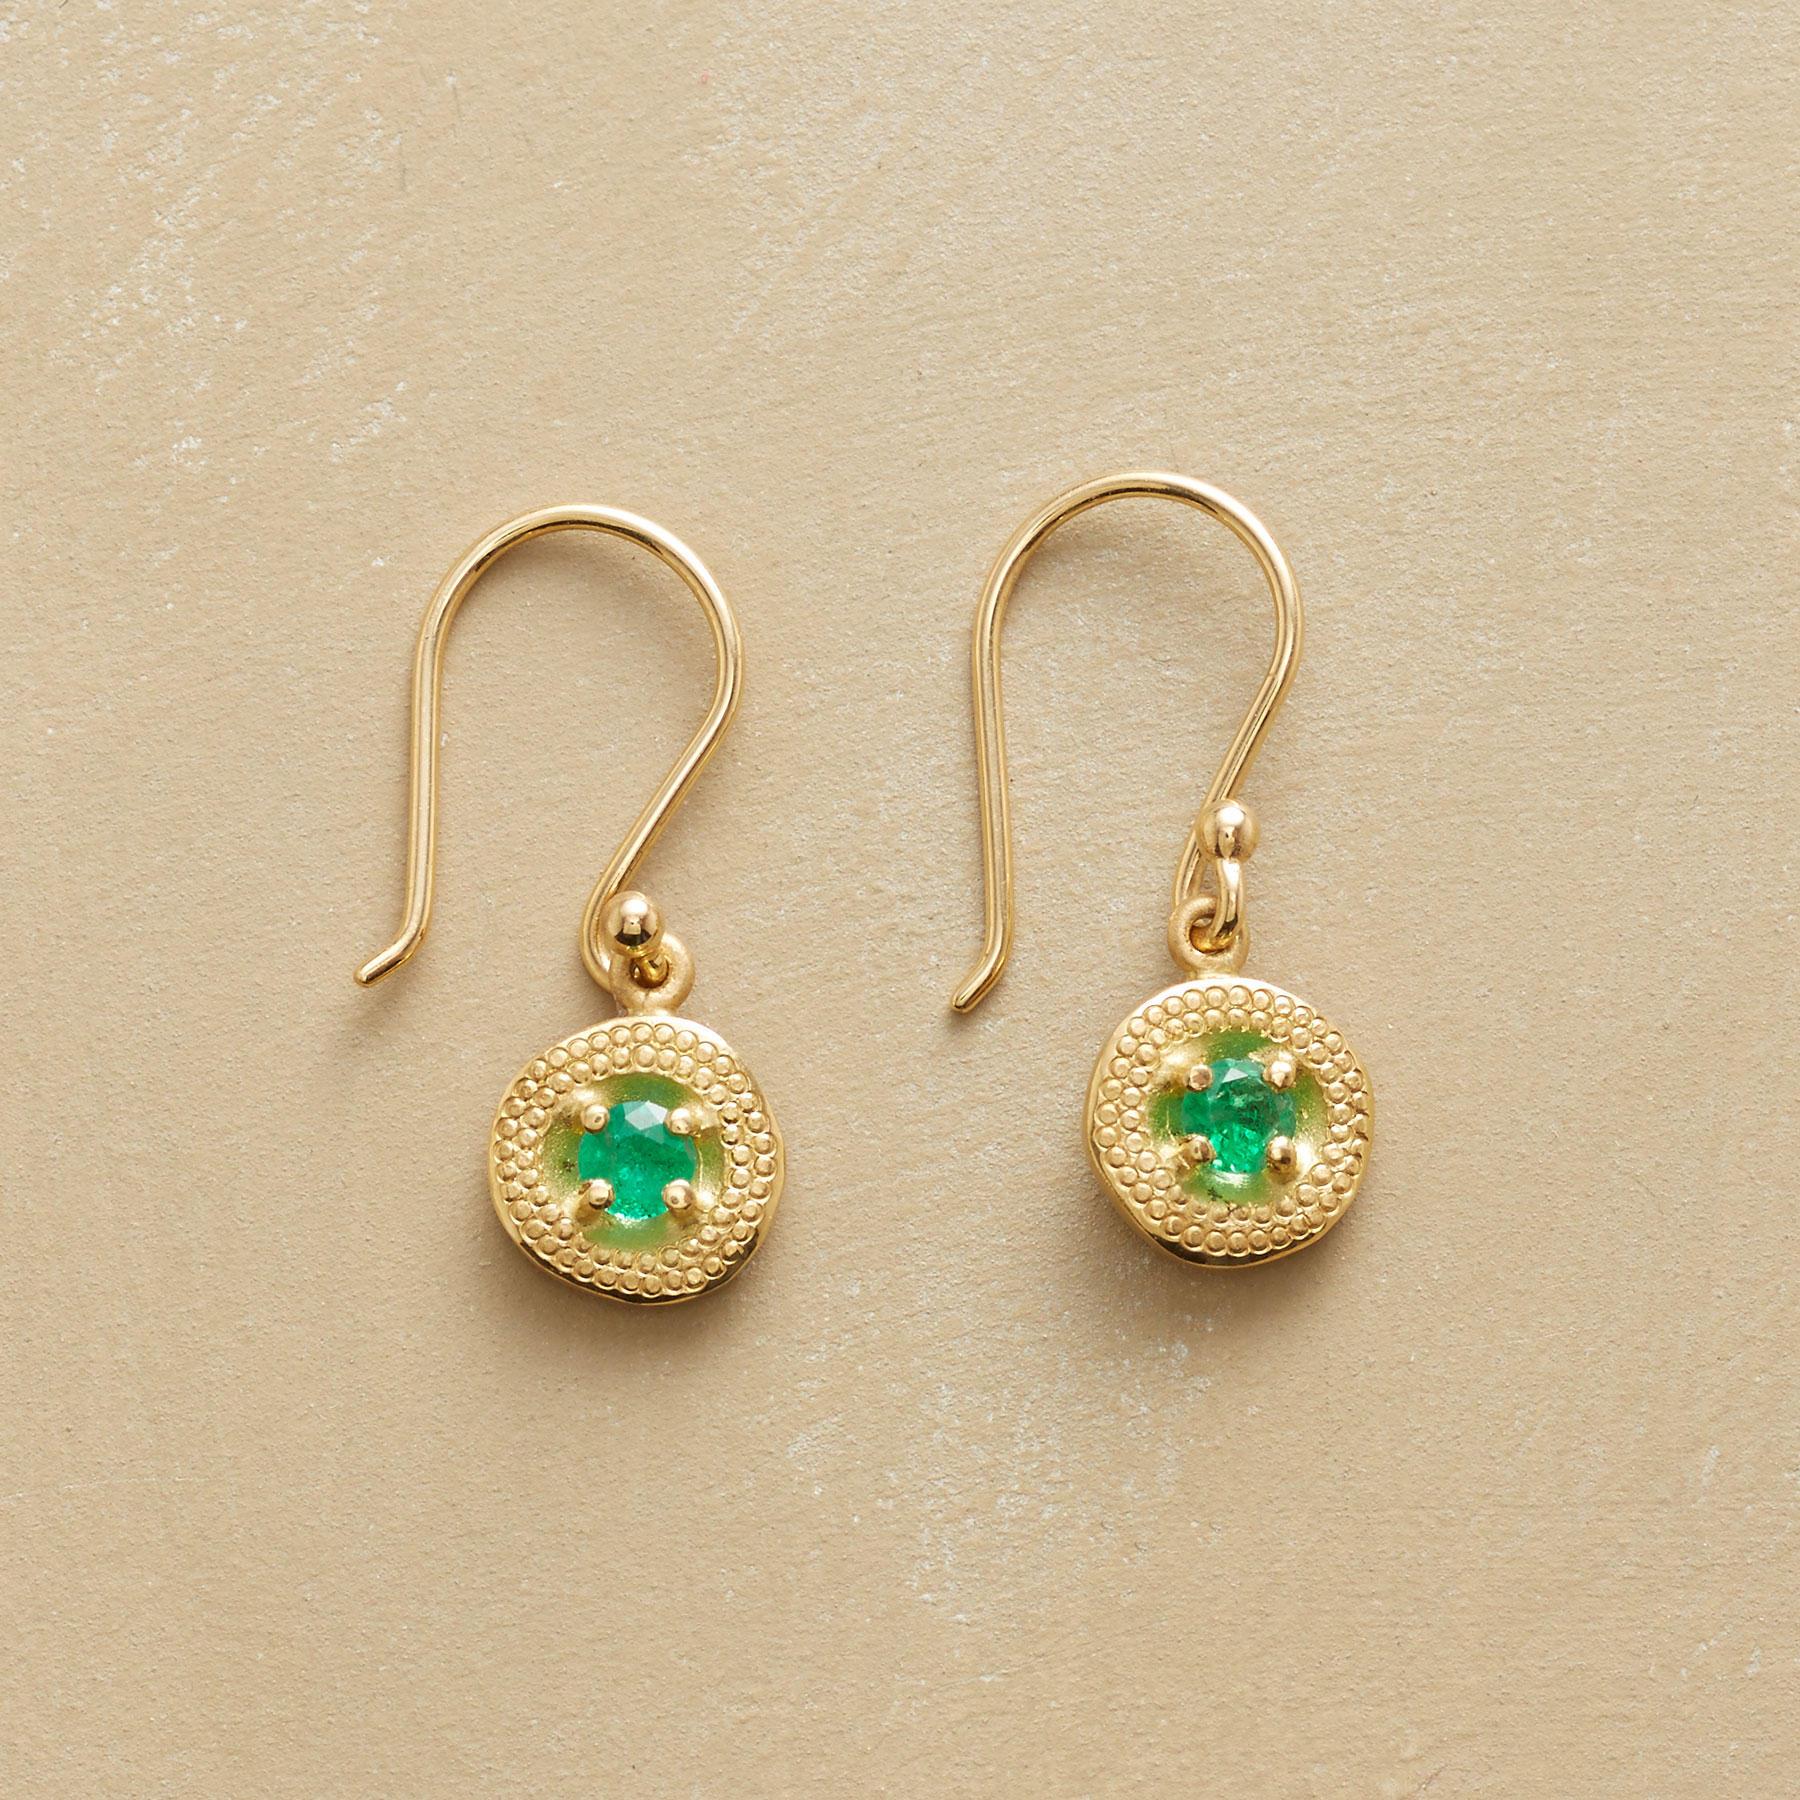 Dangling Emerald Earrings